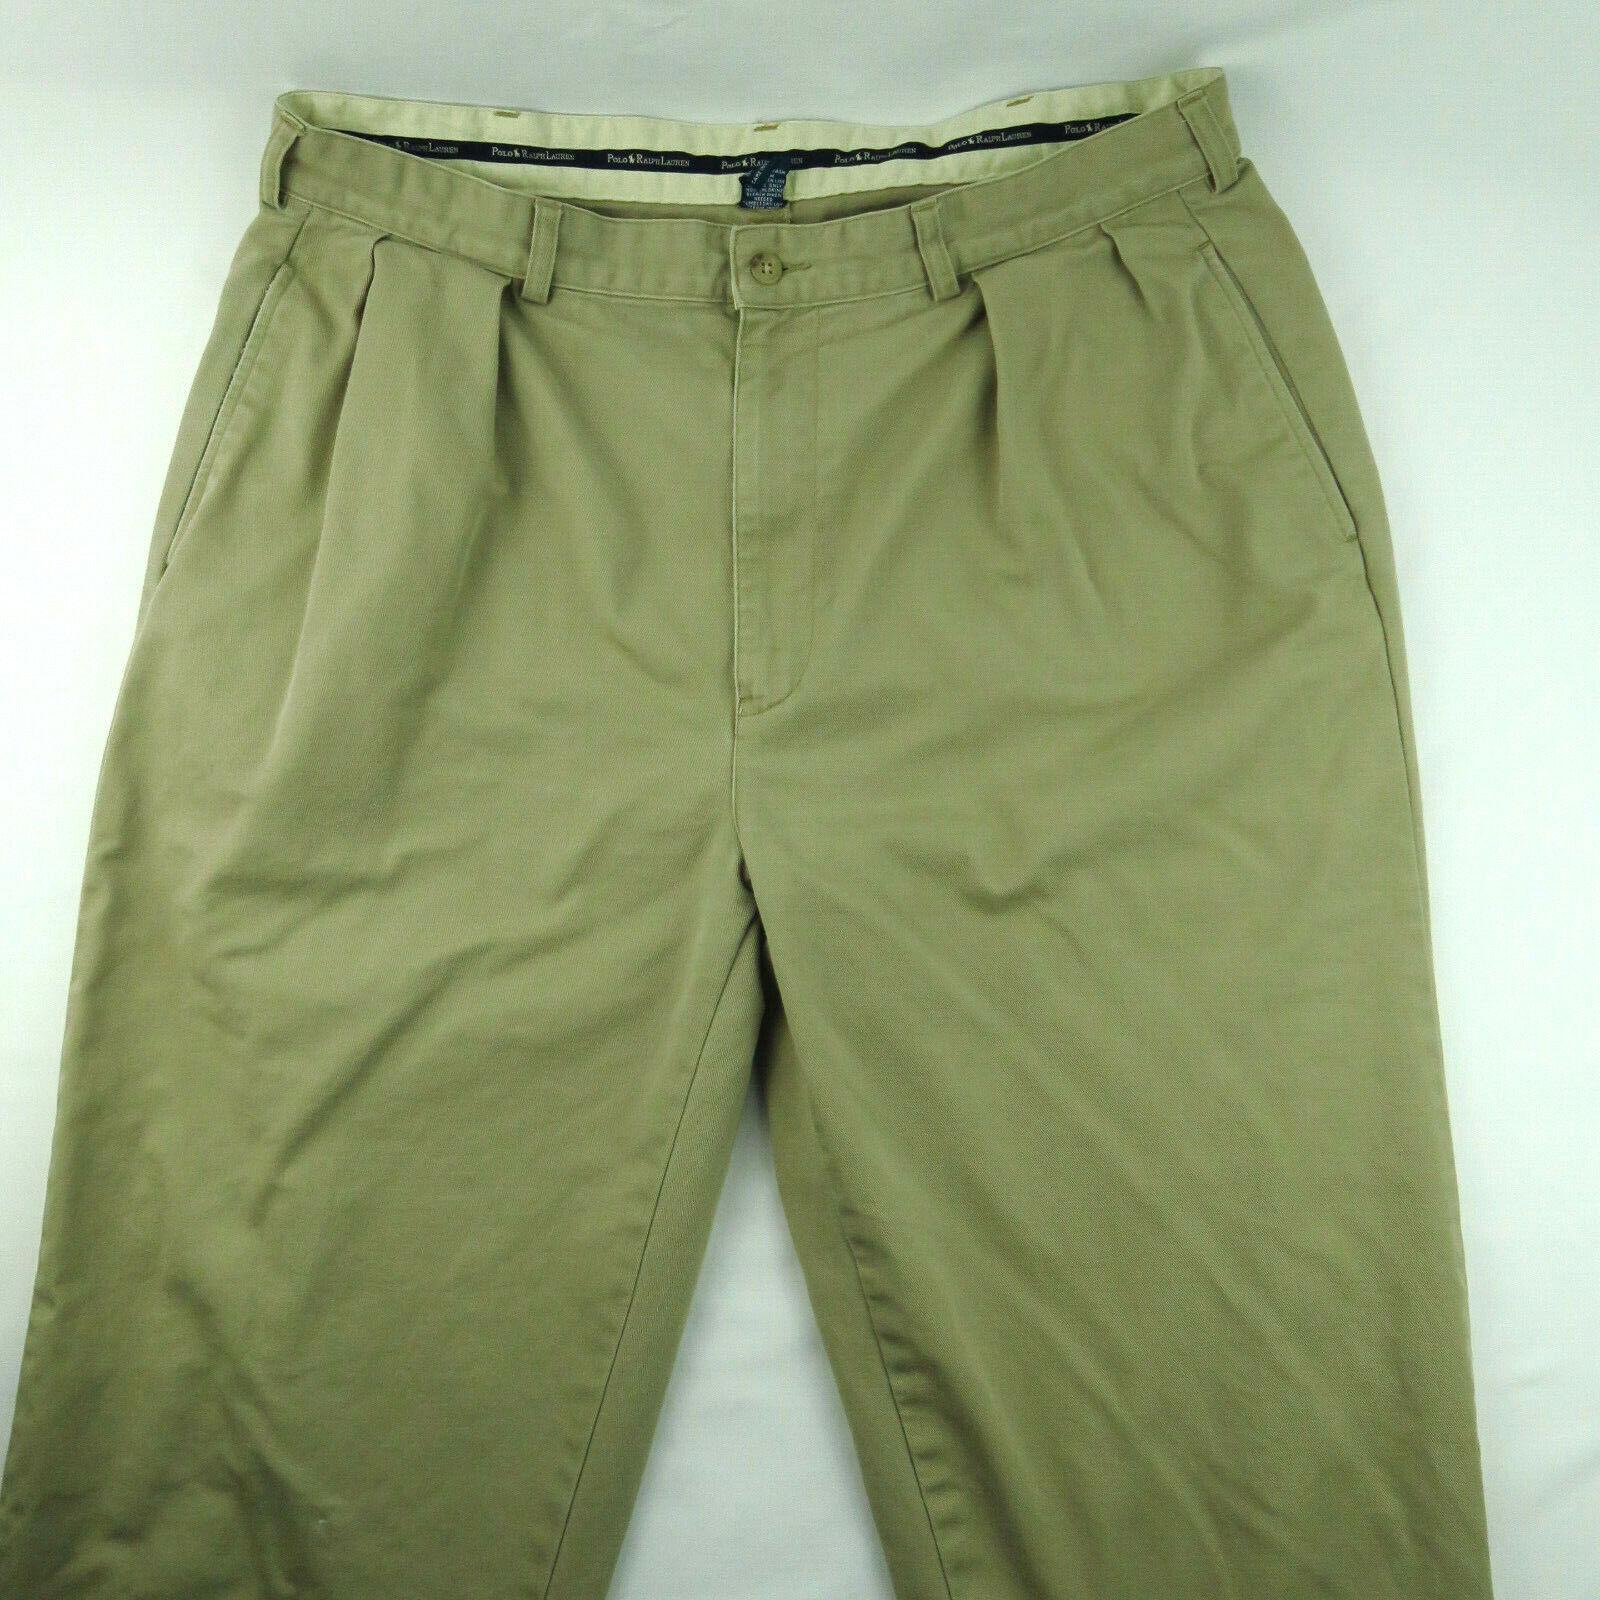 VTG Polo Chino Ralph Lauren Mens Khaki Tan Pants … - image 1